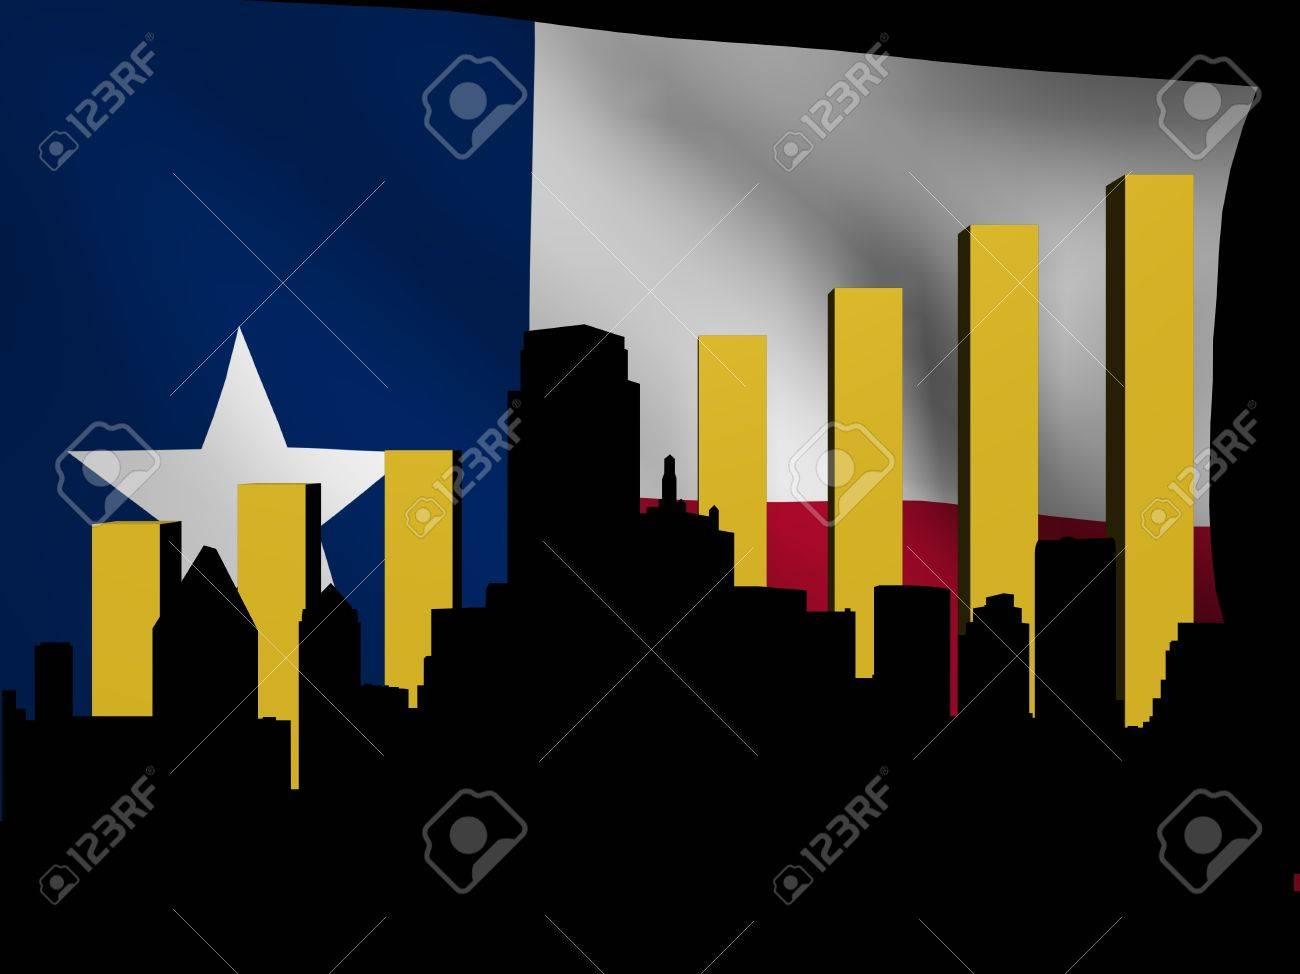 Dallas skyline and graph over Texan flag illustration Stock Illustration - 13008205